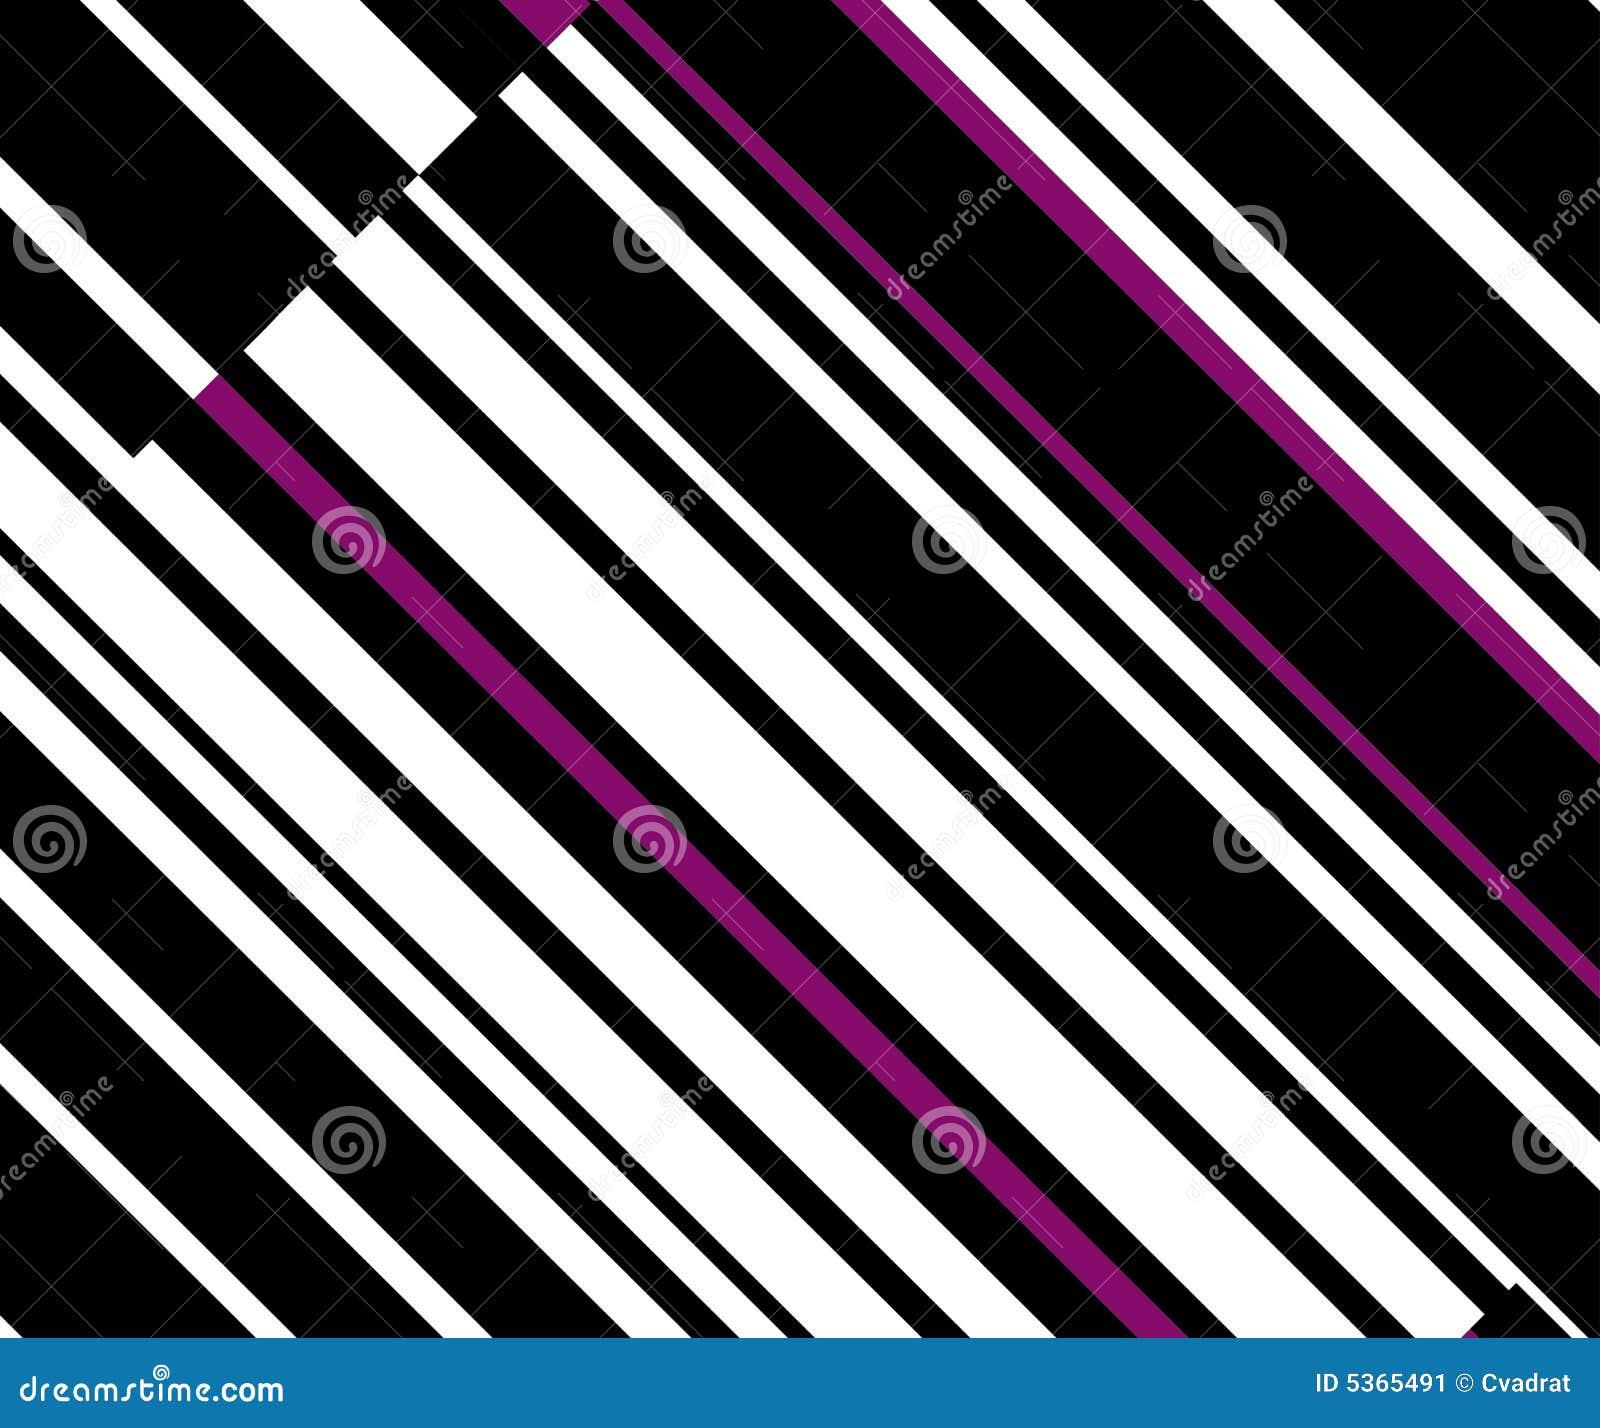 Diagonal Line In Art : Op art homage to gf diagonal lines two stock image